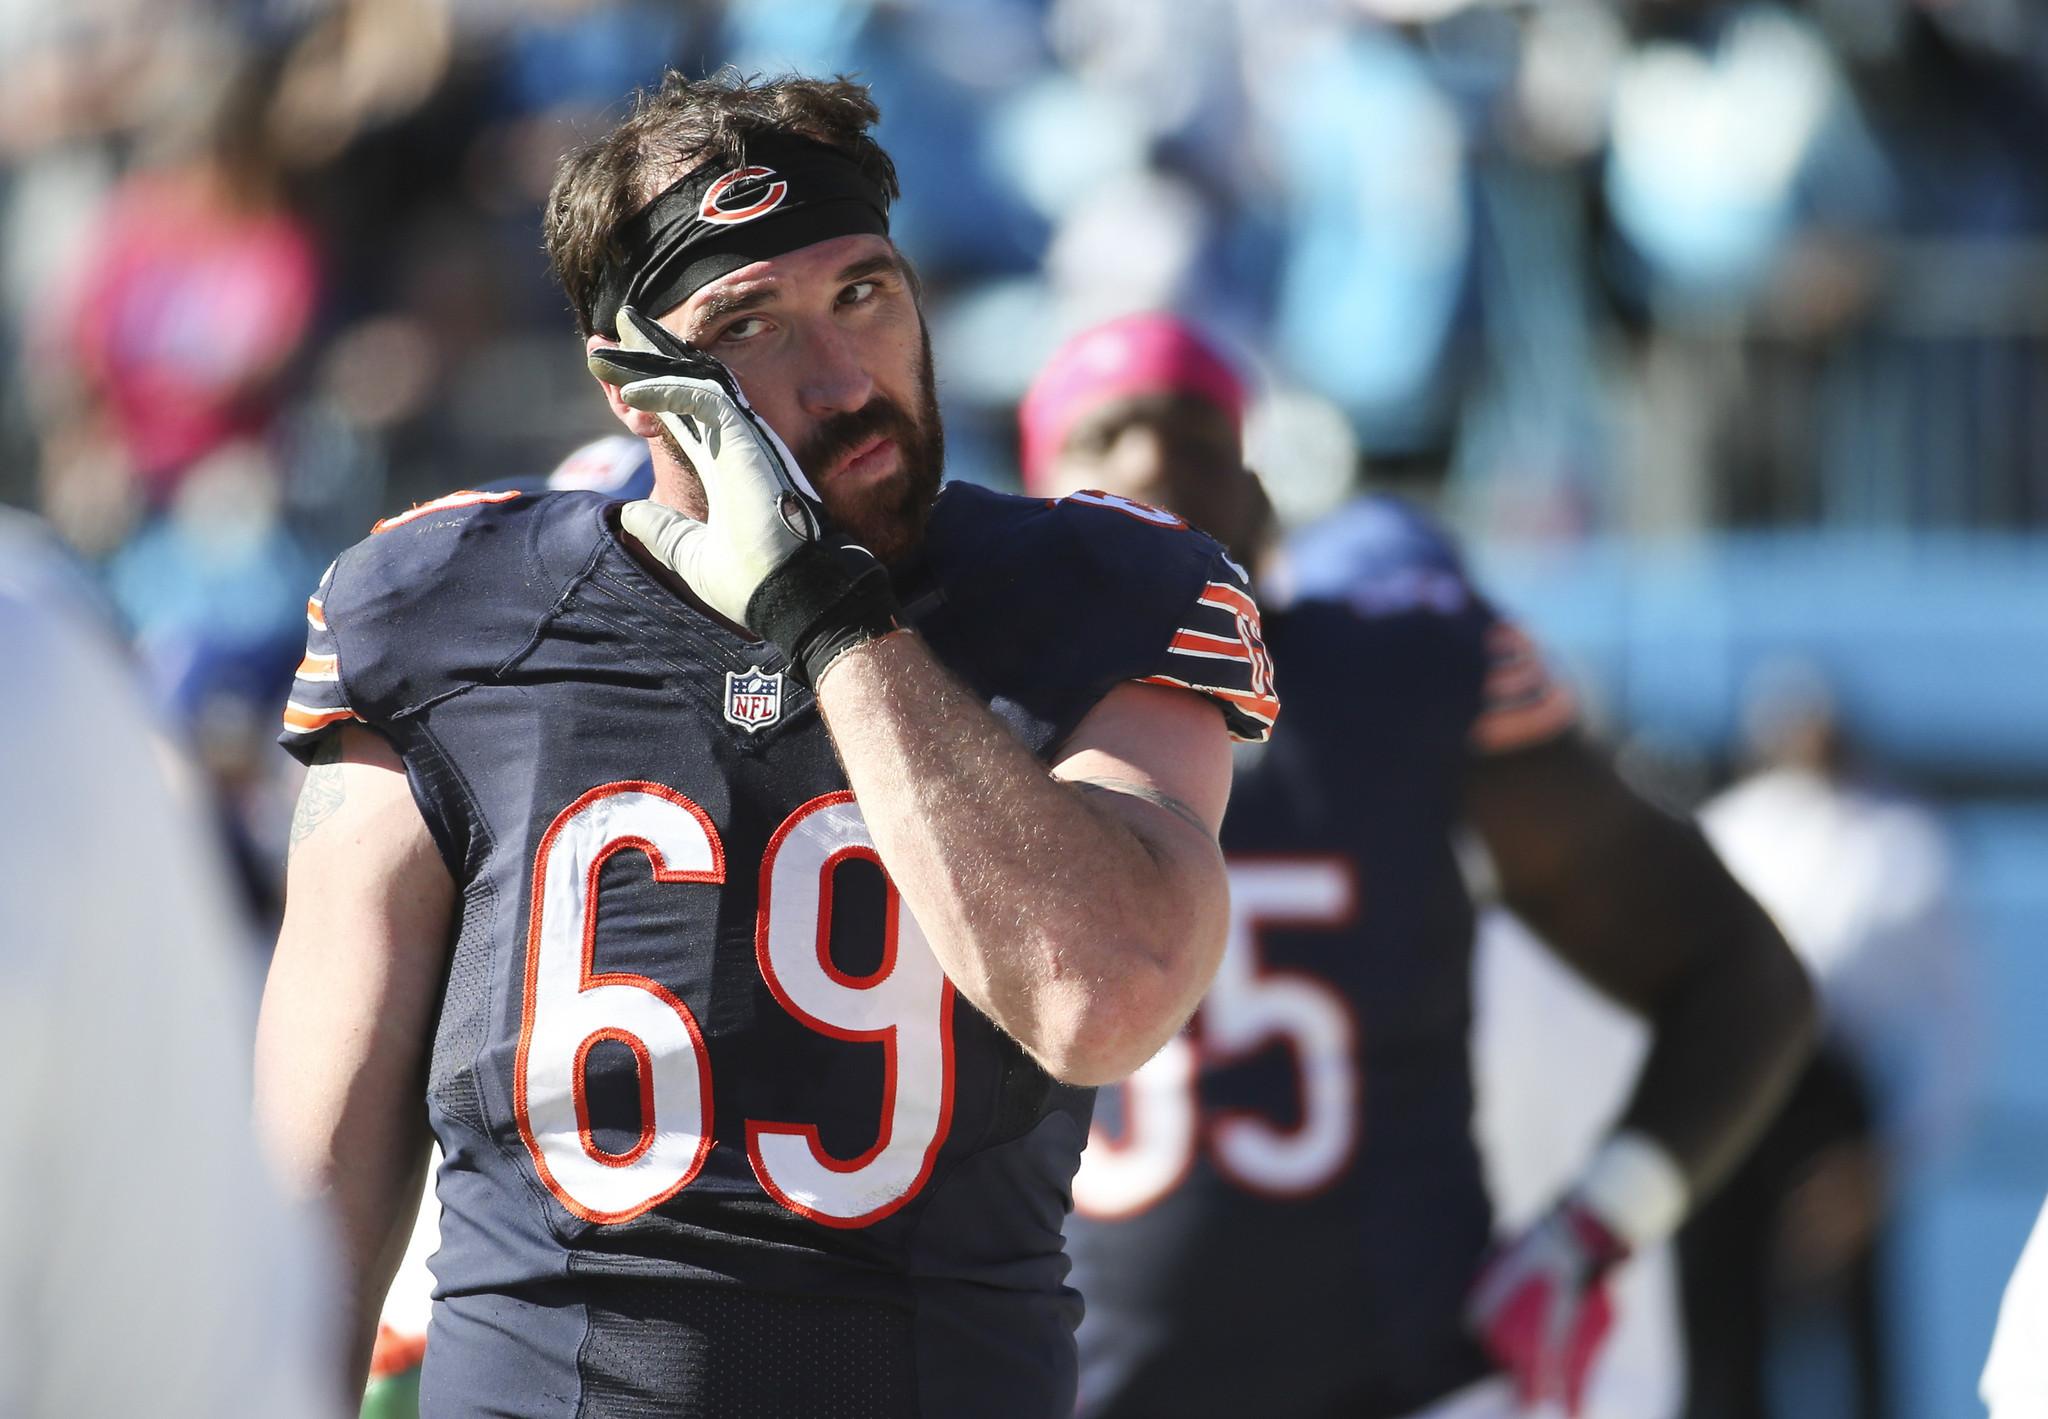 Bears' Jared Allen confident sacks will come